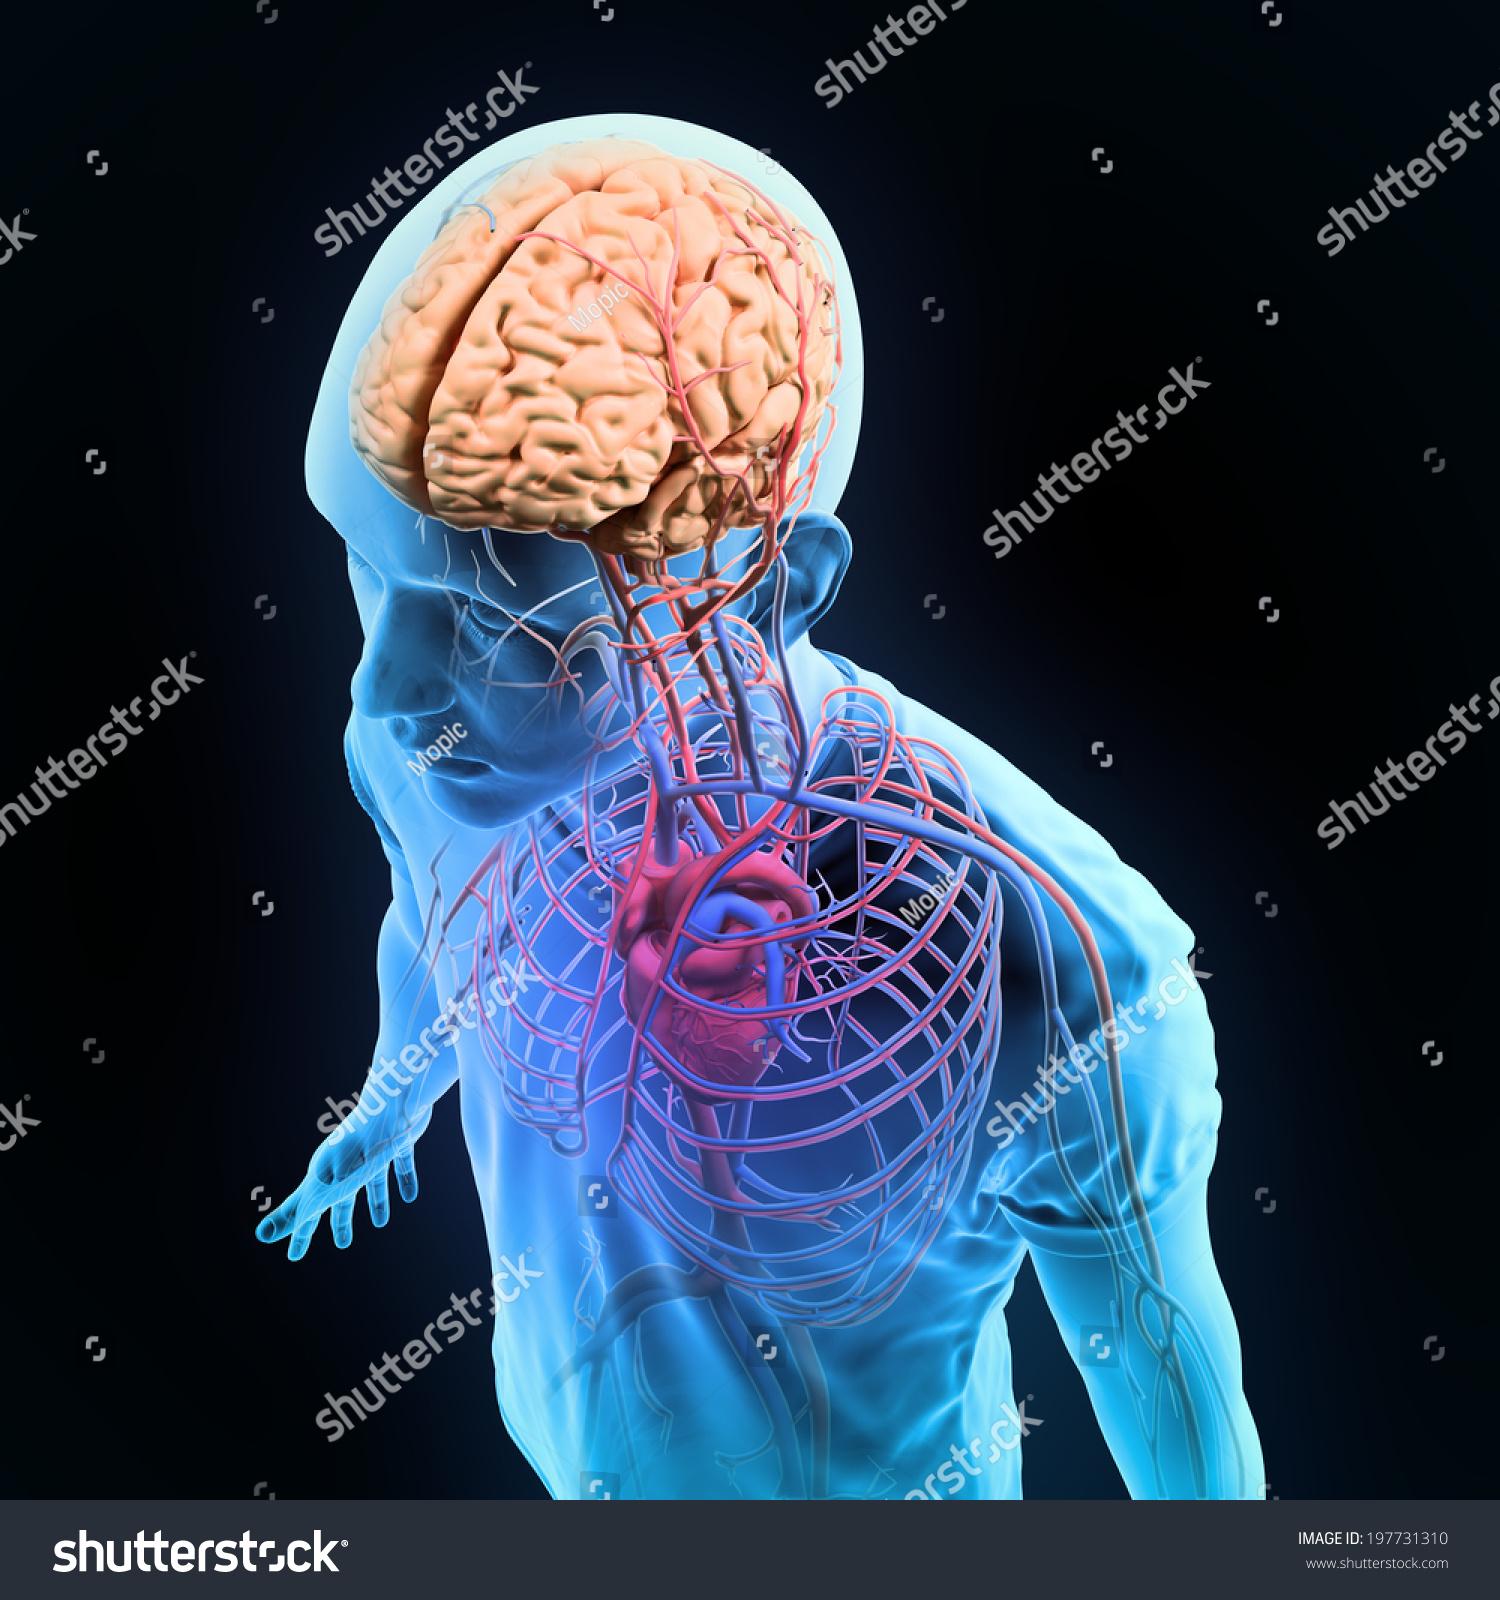 Human Anatomy Illustration Central Nervous System Stock